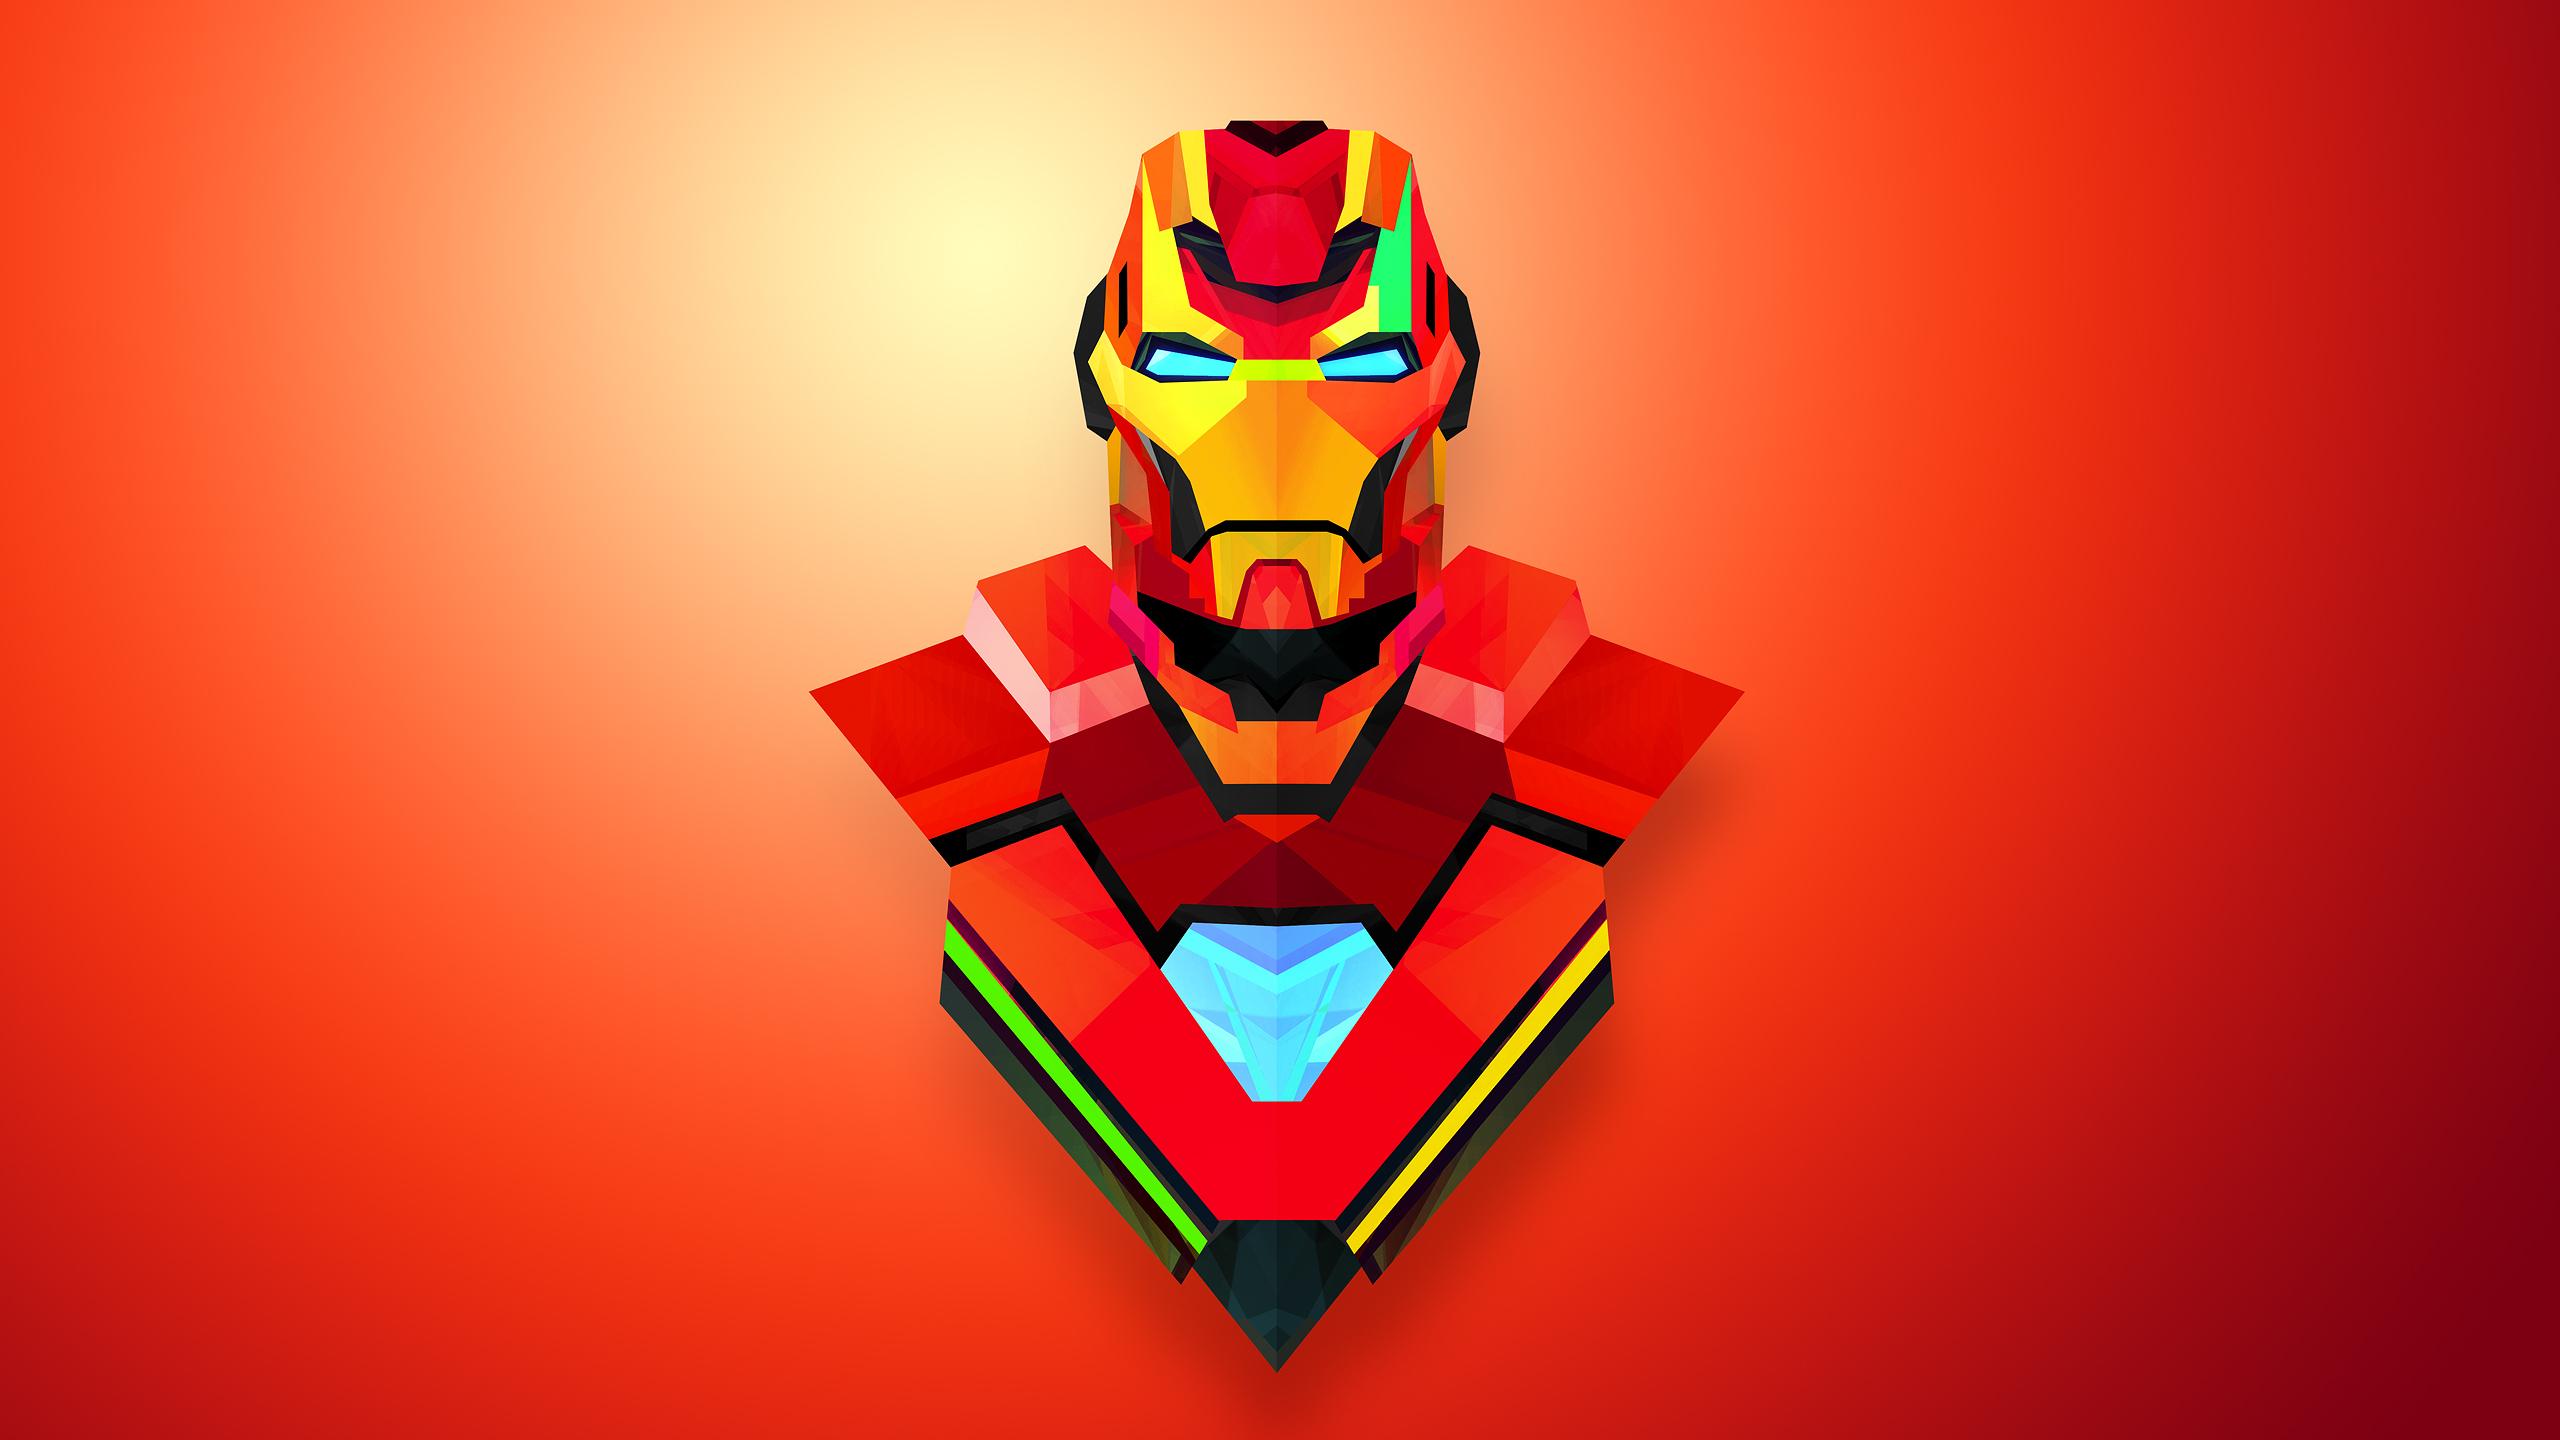 2560x1440 Wallpaper Heroes Comics Iron Man Hero Fantasy Vector 2560x1440